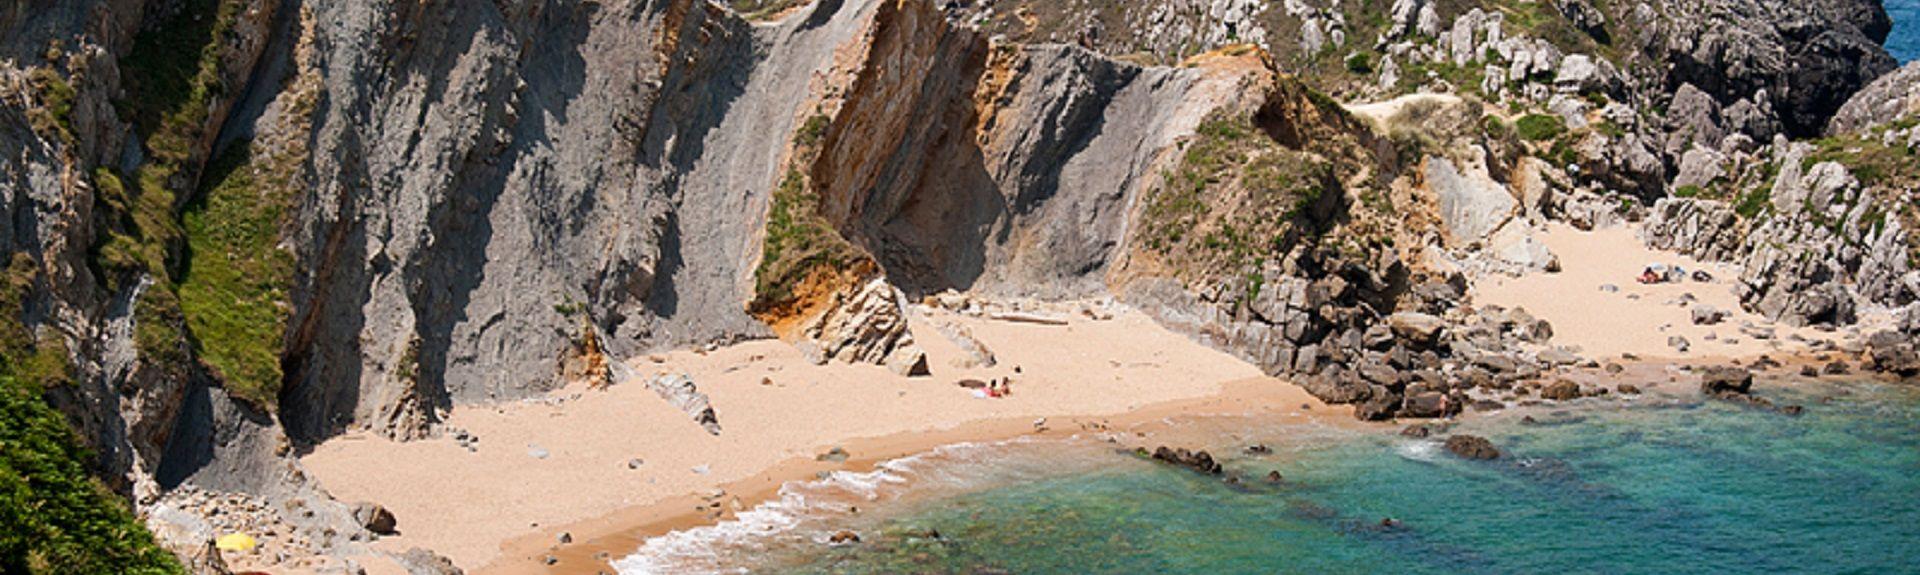 Comillas Beach, Comillas, Spain